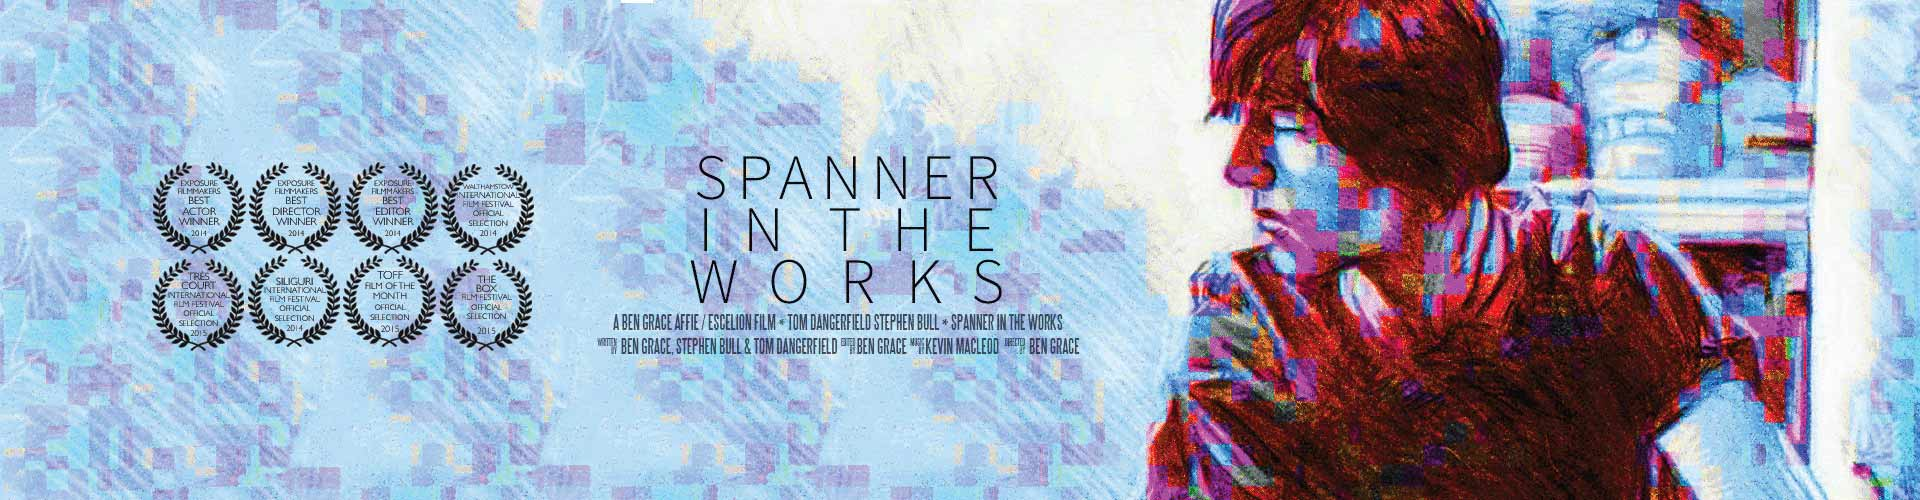 Spanner in the Works| Ben Grace Films | BenGrace.co.uk